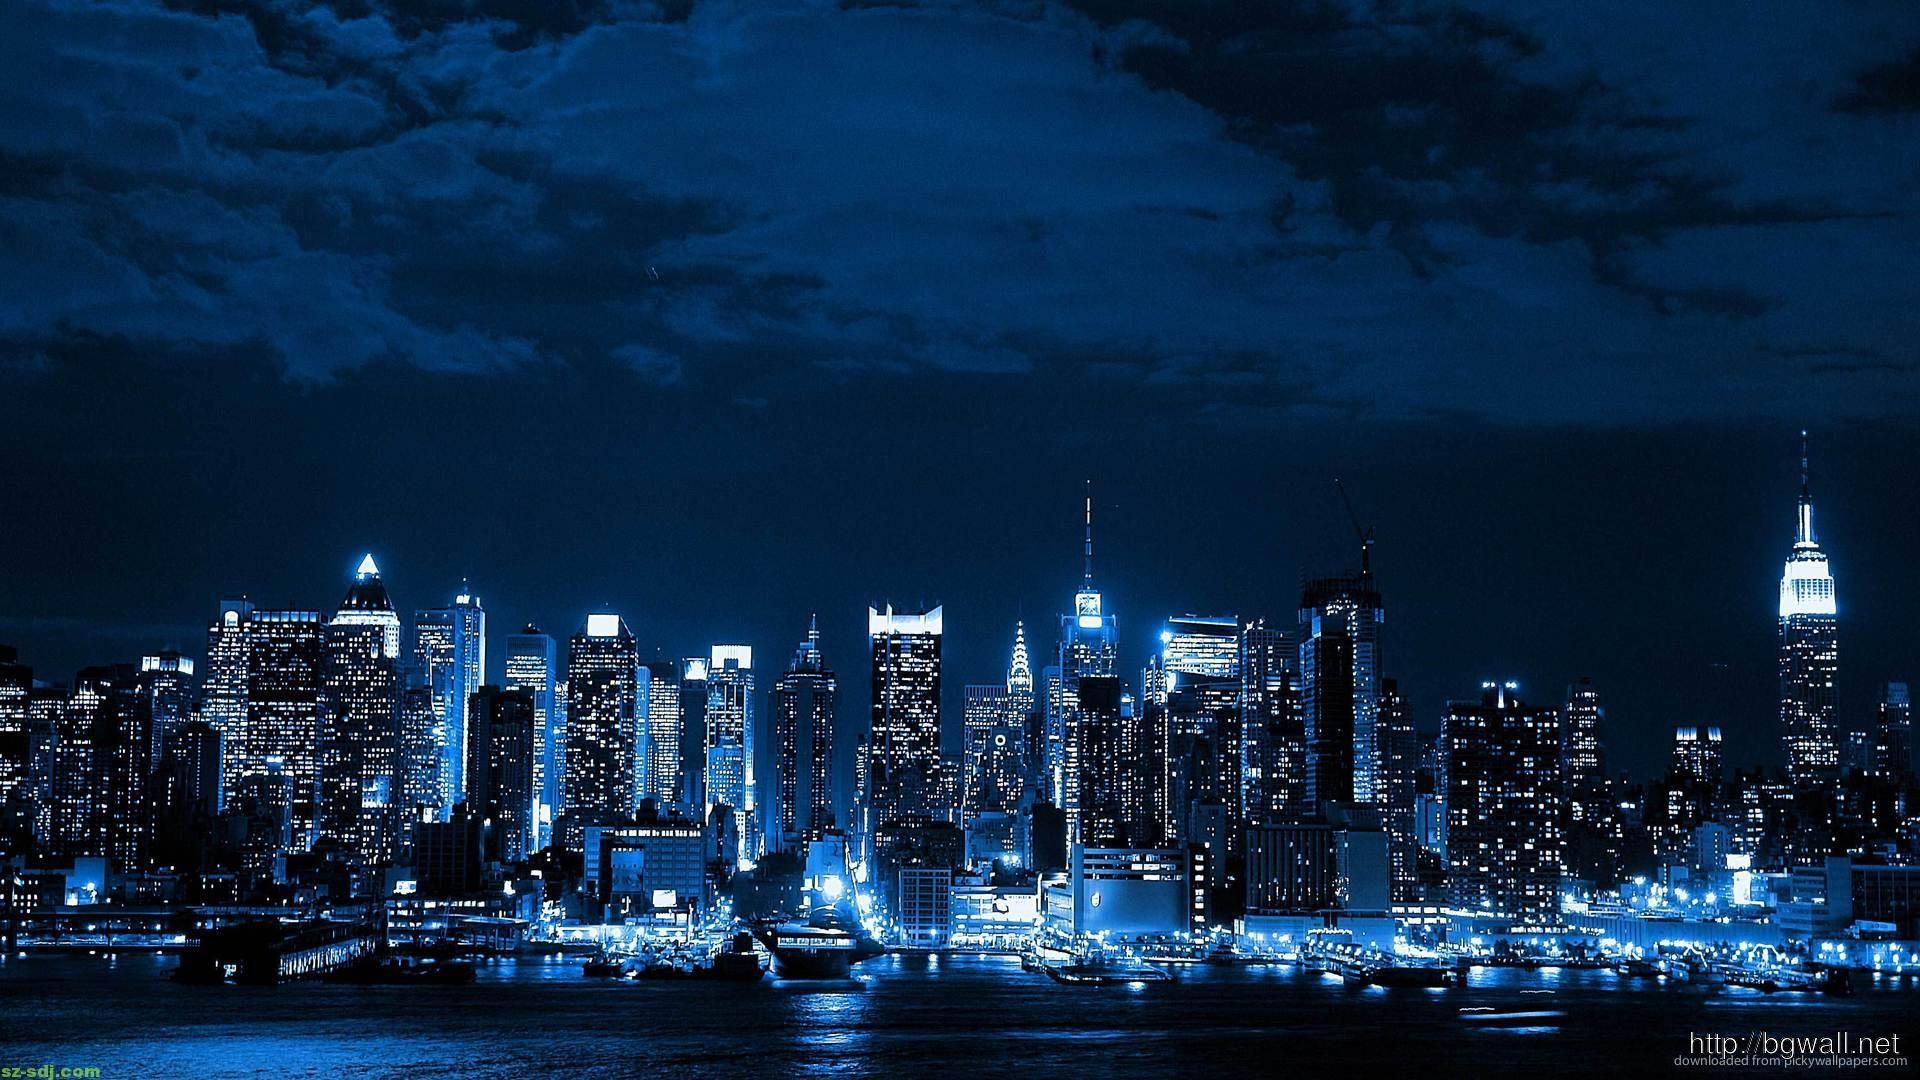 pin city nightlife wallpaper - photo #3